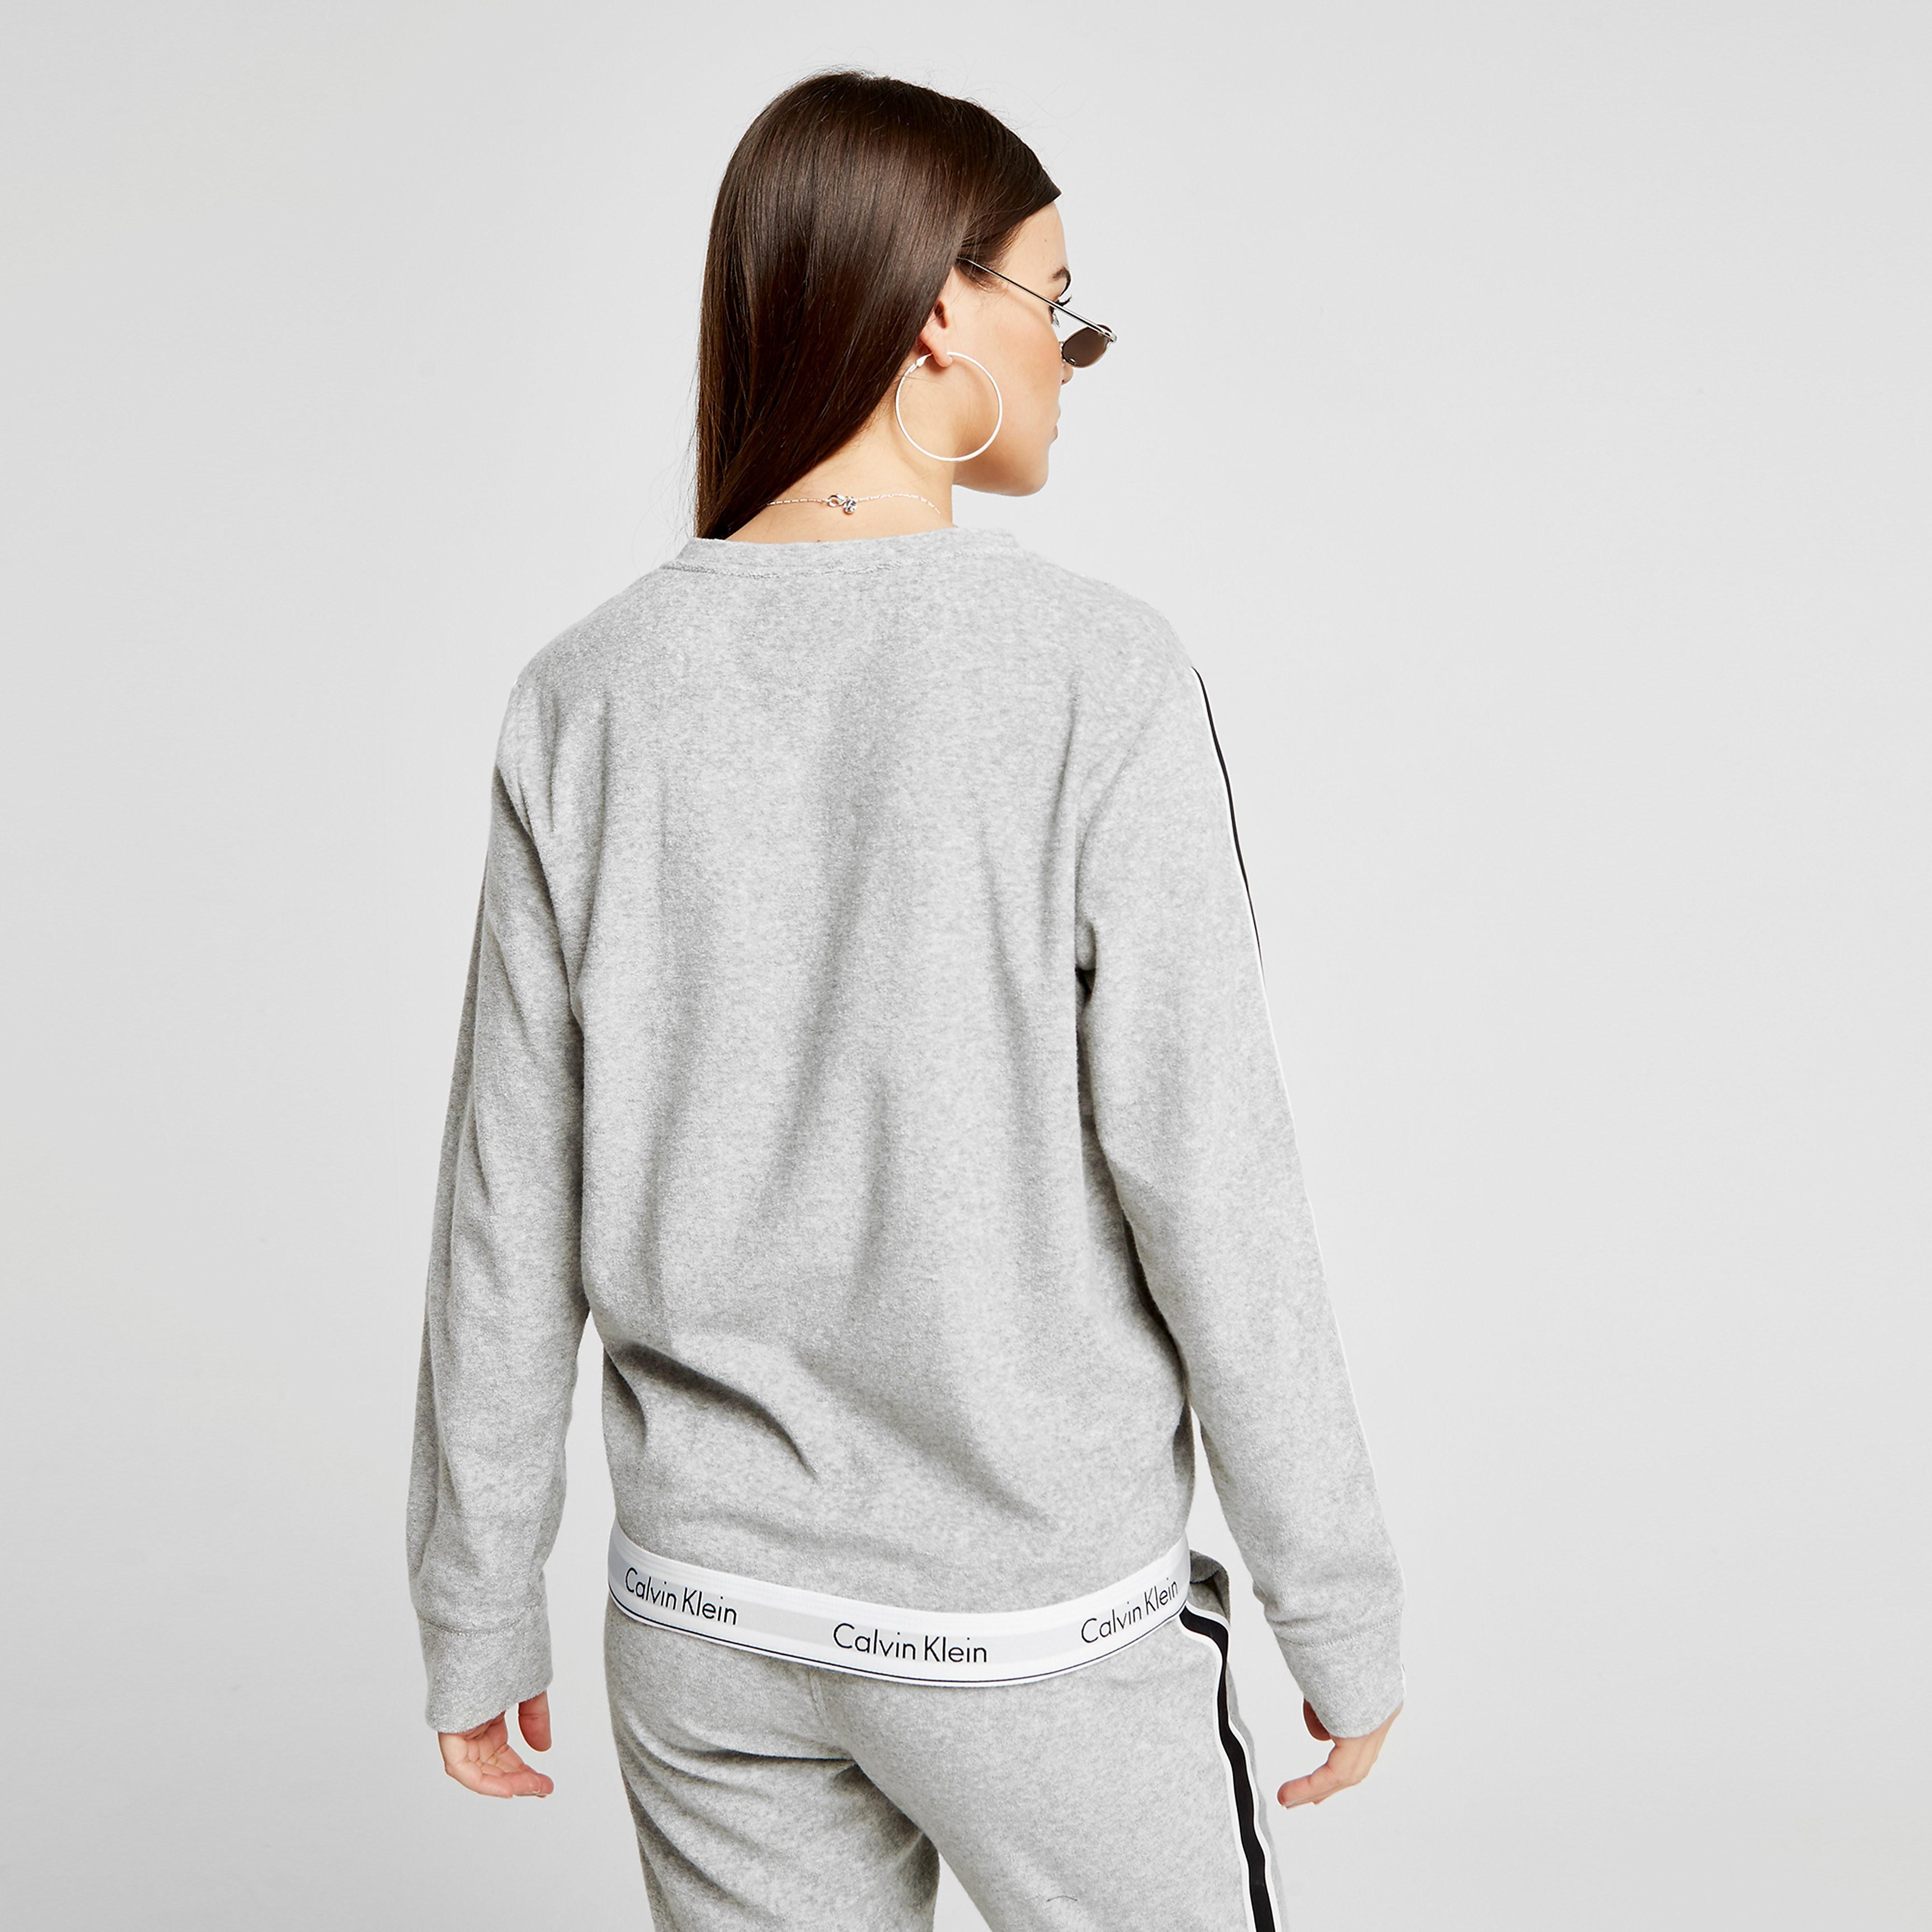 Calvin Klein Americana Sweatshirt